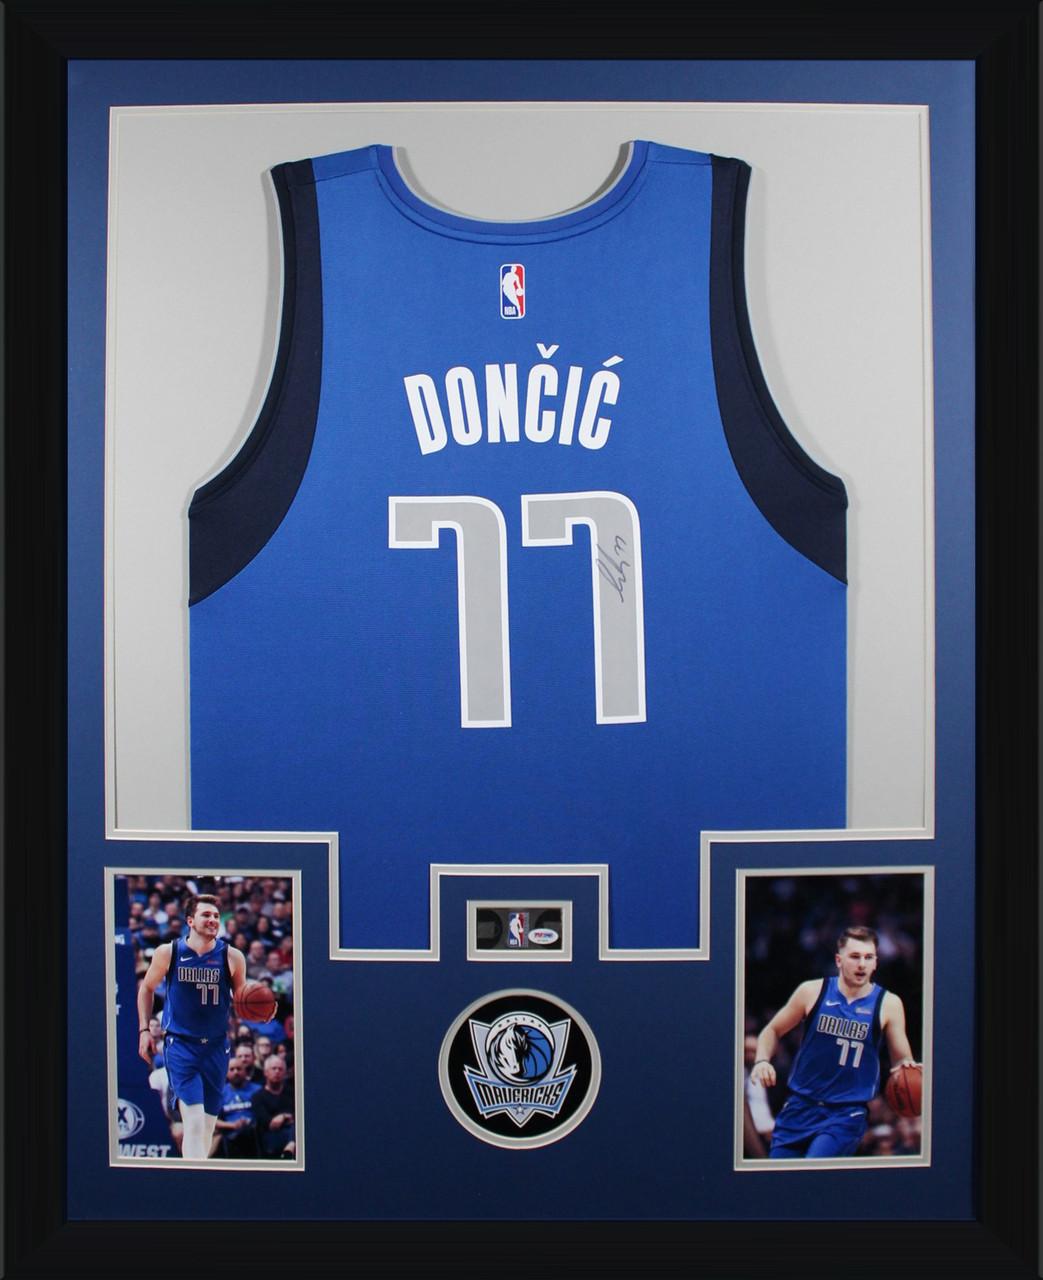 Luka Doncic Autographed Framed Jersey Dallas Mavericks Signed Fanatics Basketball Psa Dna Coa